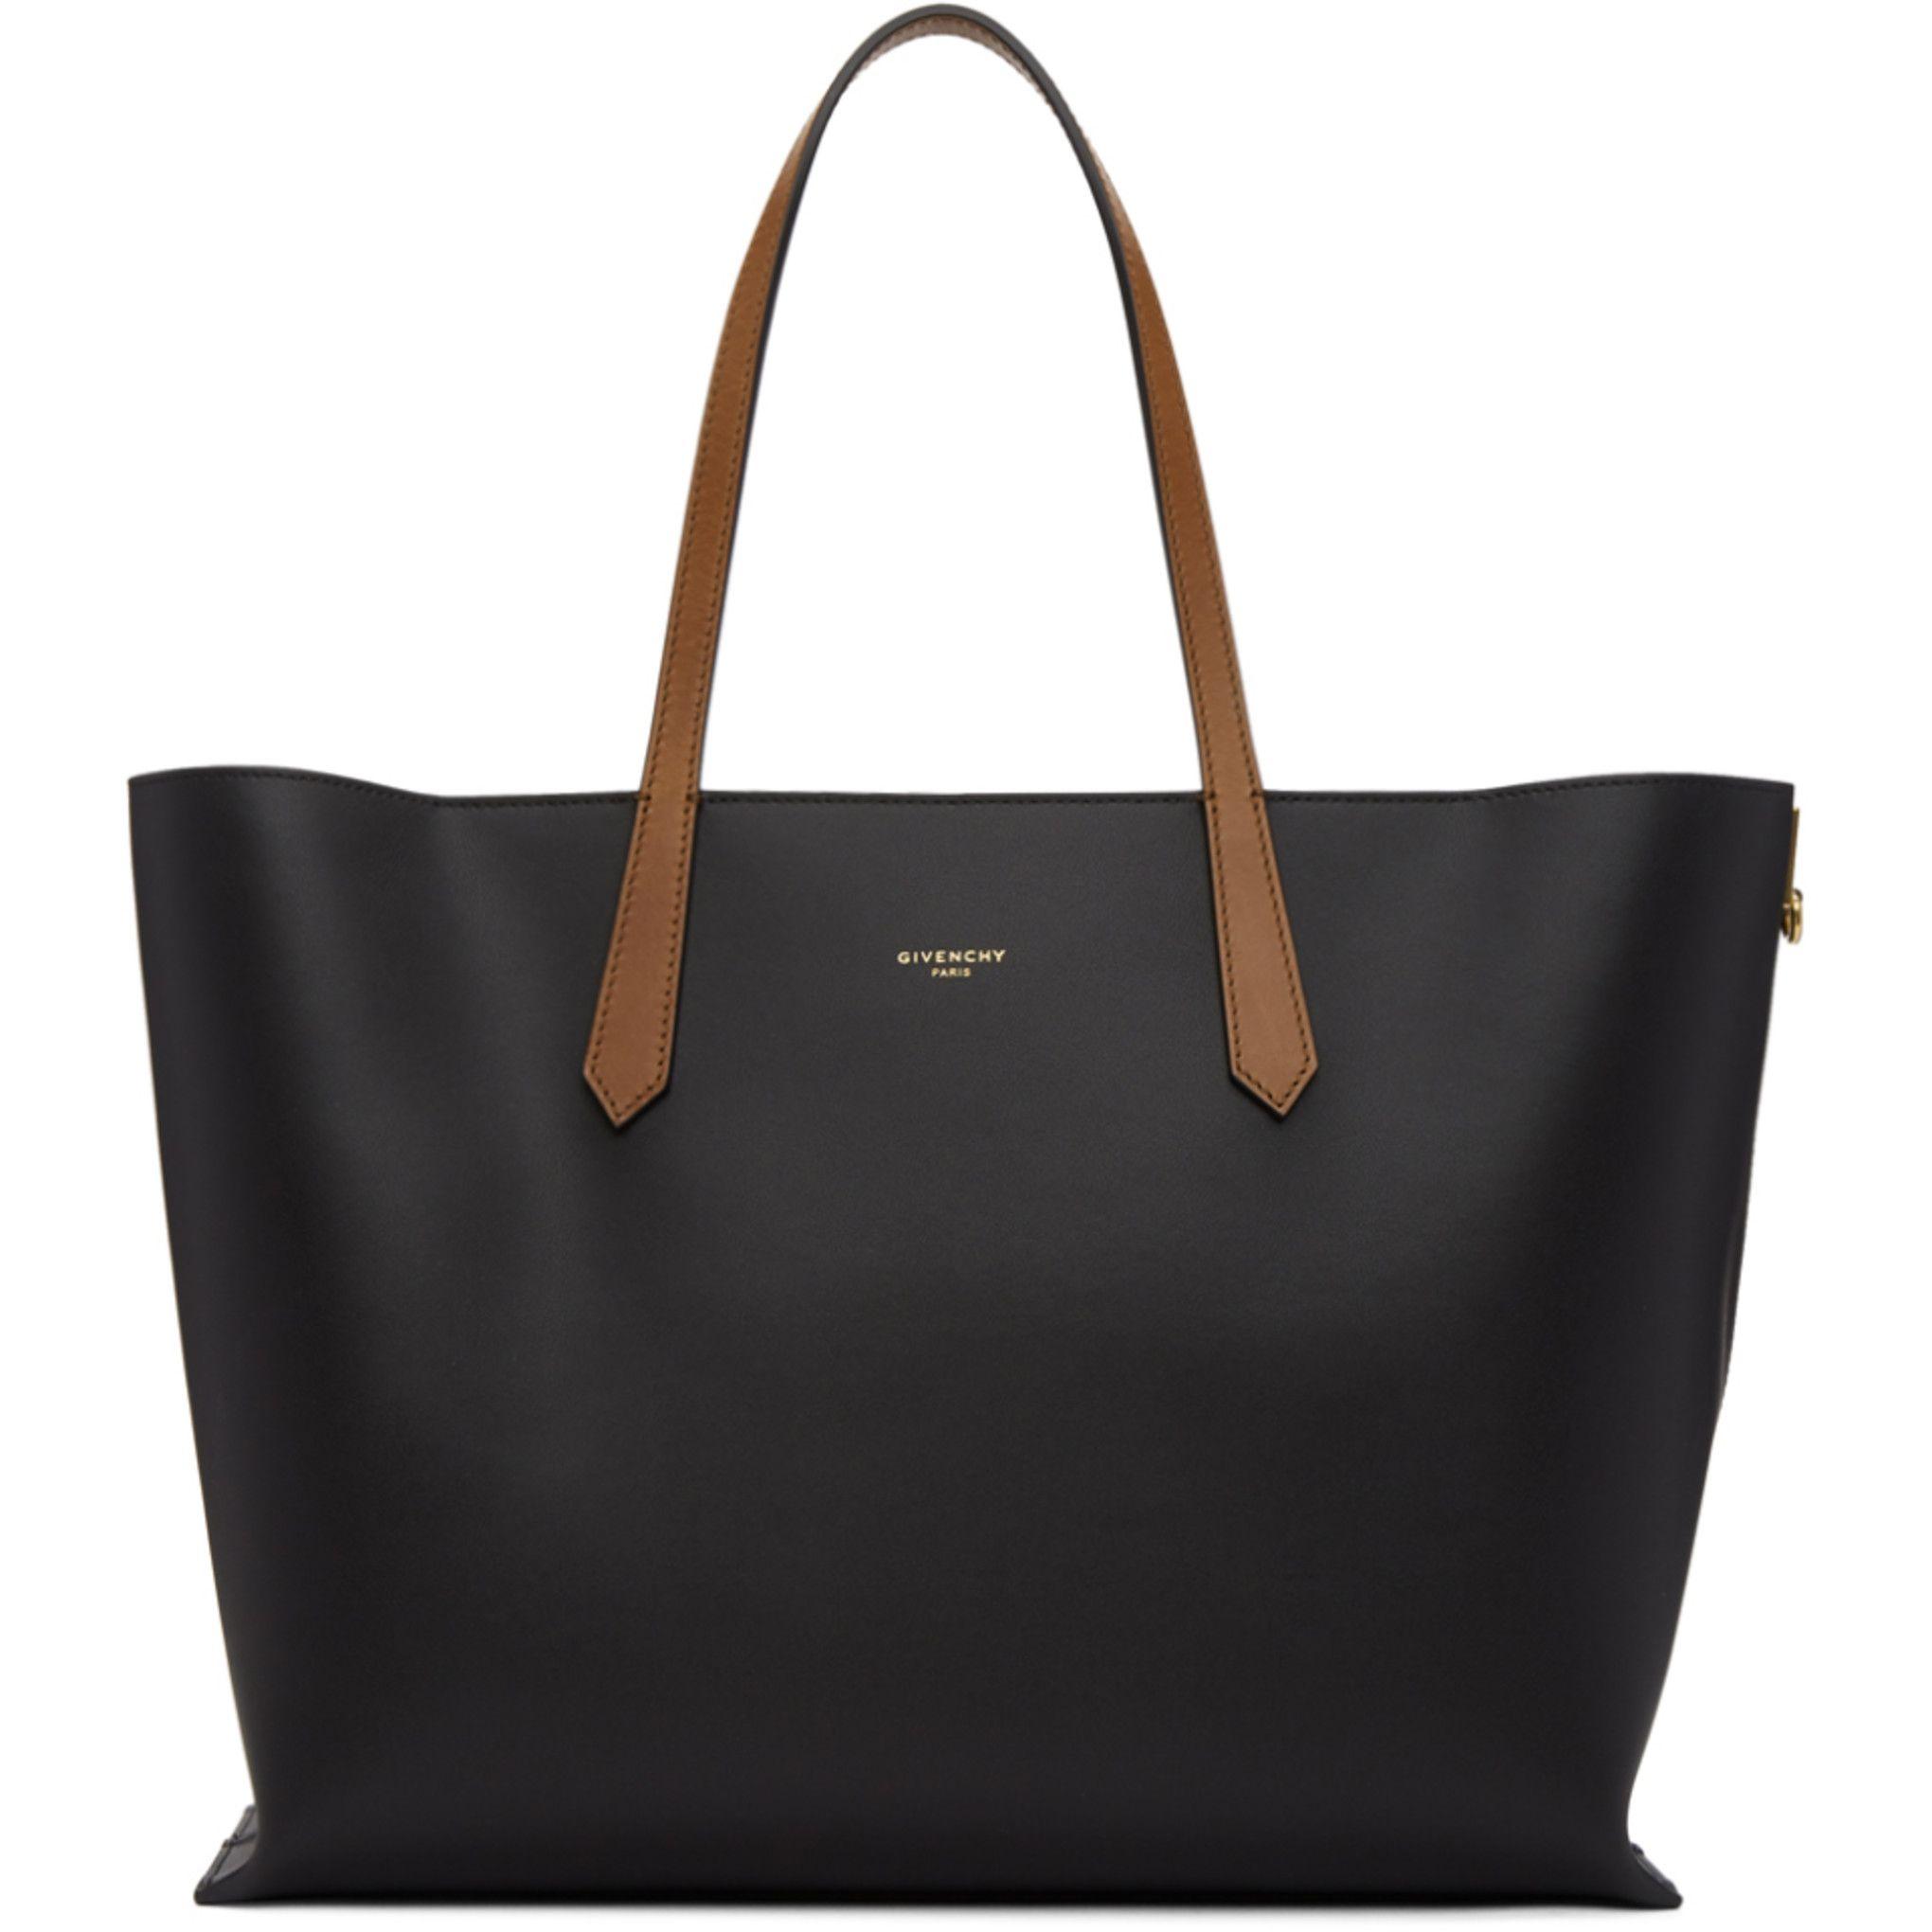 195328baa4fc3 Givenchy - Black GV Shopper Tote